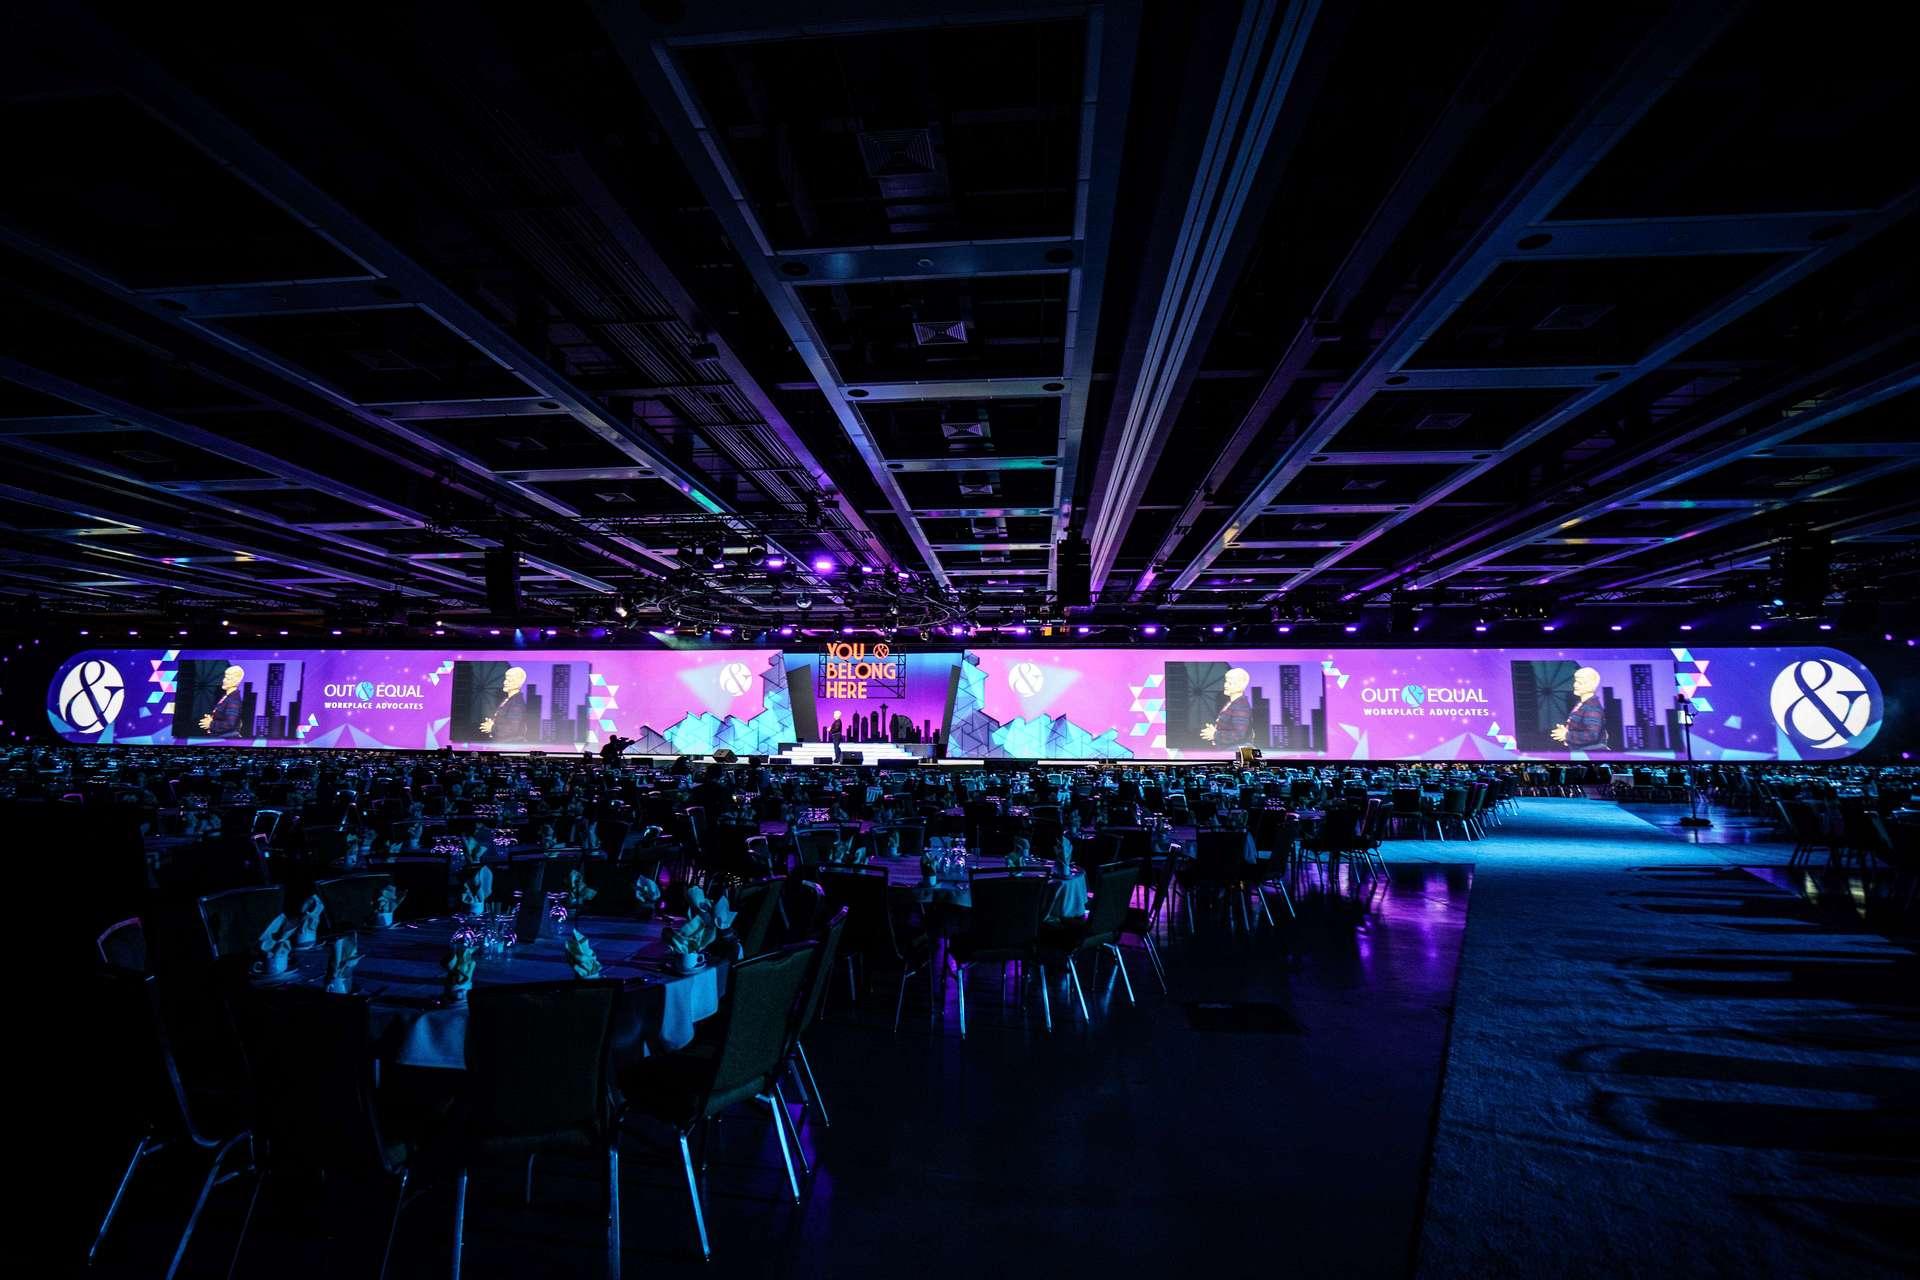 Convention setup photography